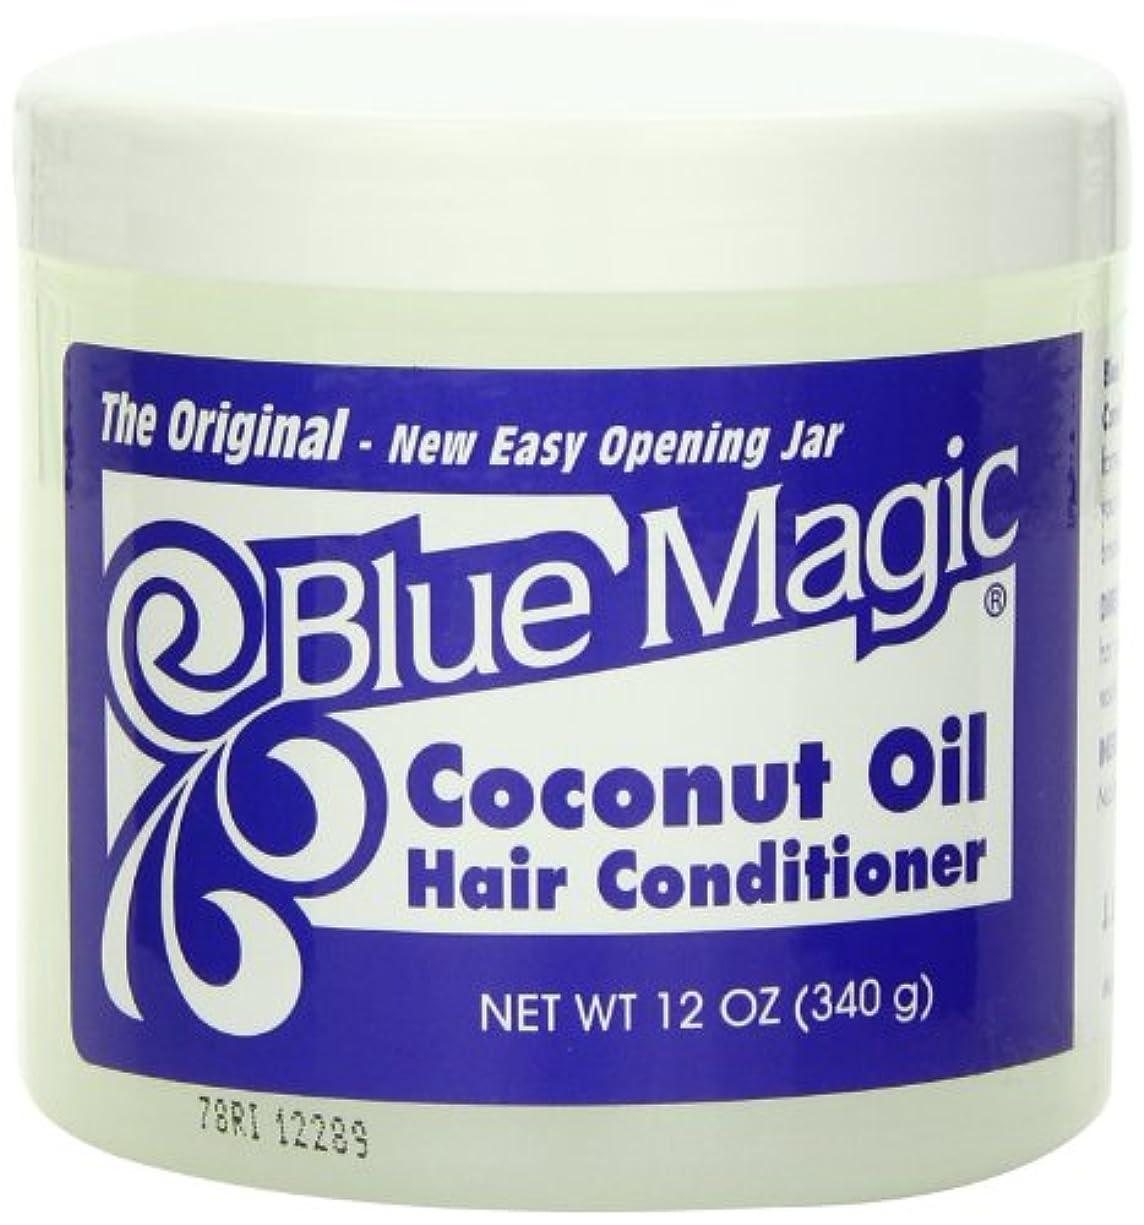 Blue Magic Coconut Oil Hair Conditioner Case by DDI